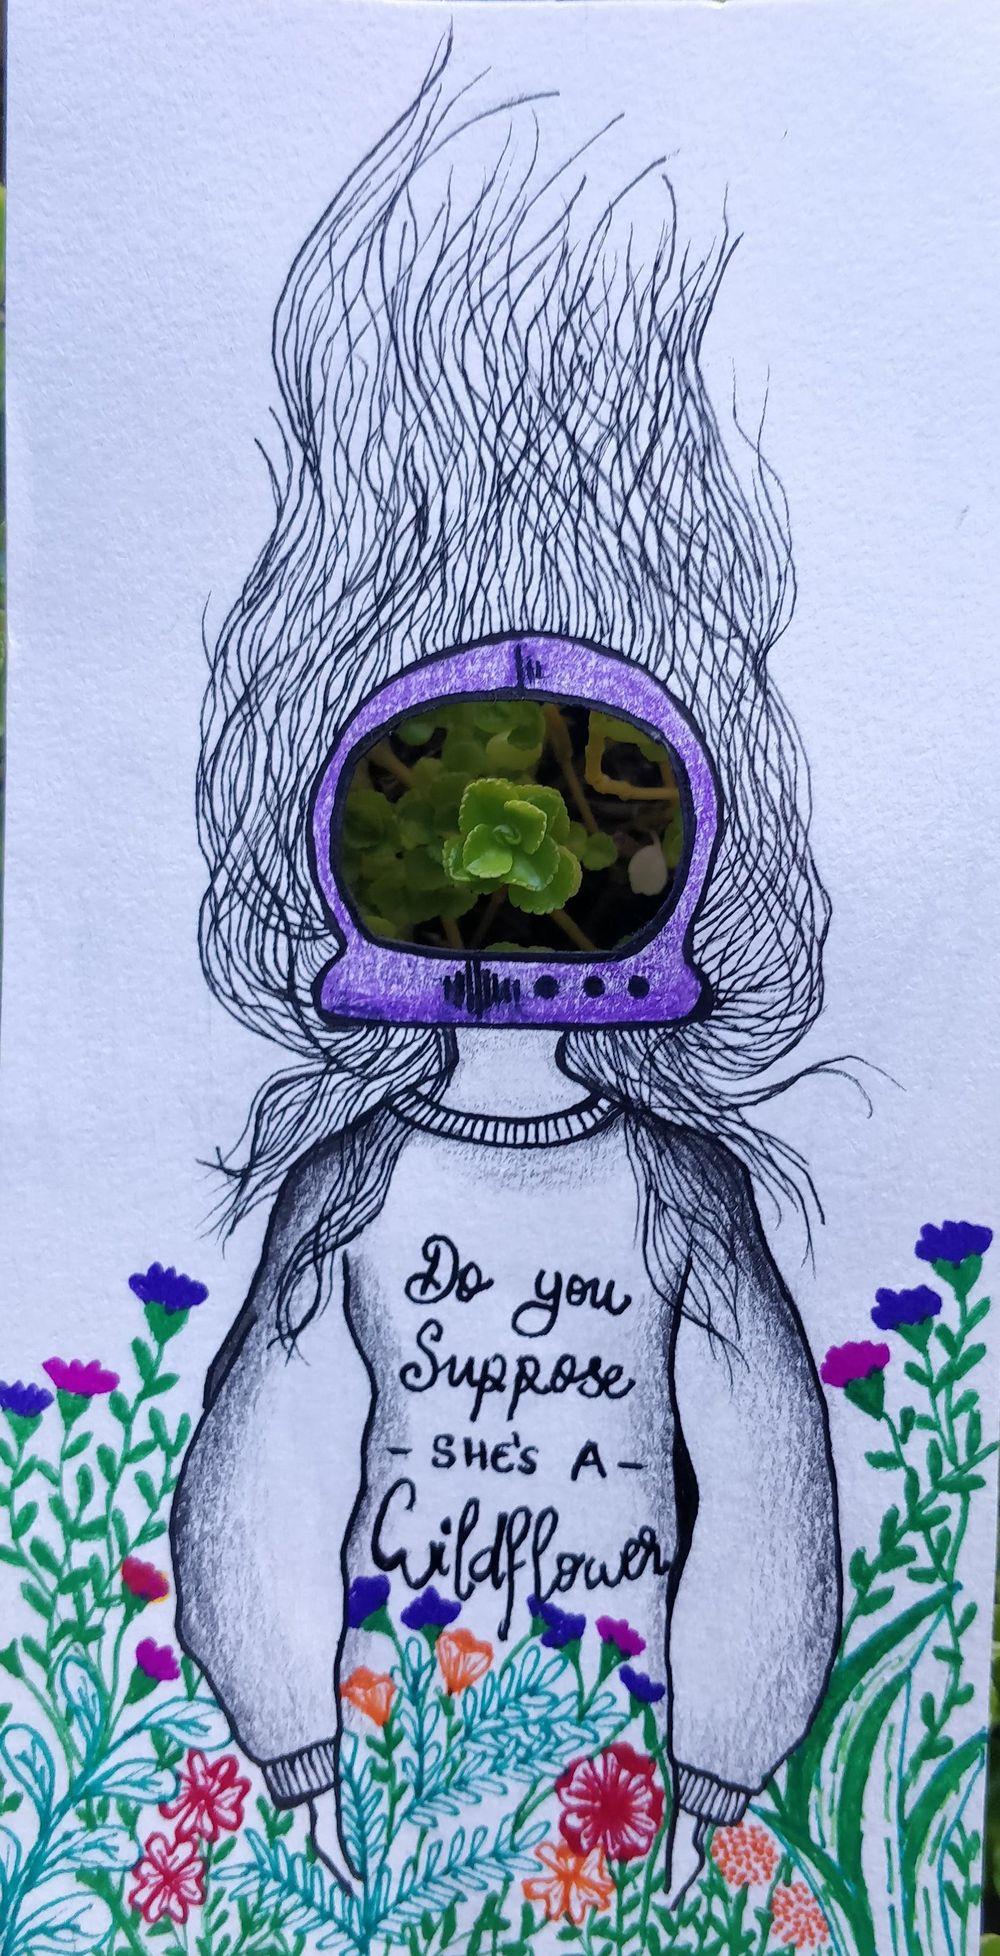 Art Project (Sketchbook Magic) - image 2 - student project